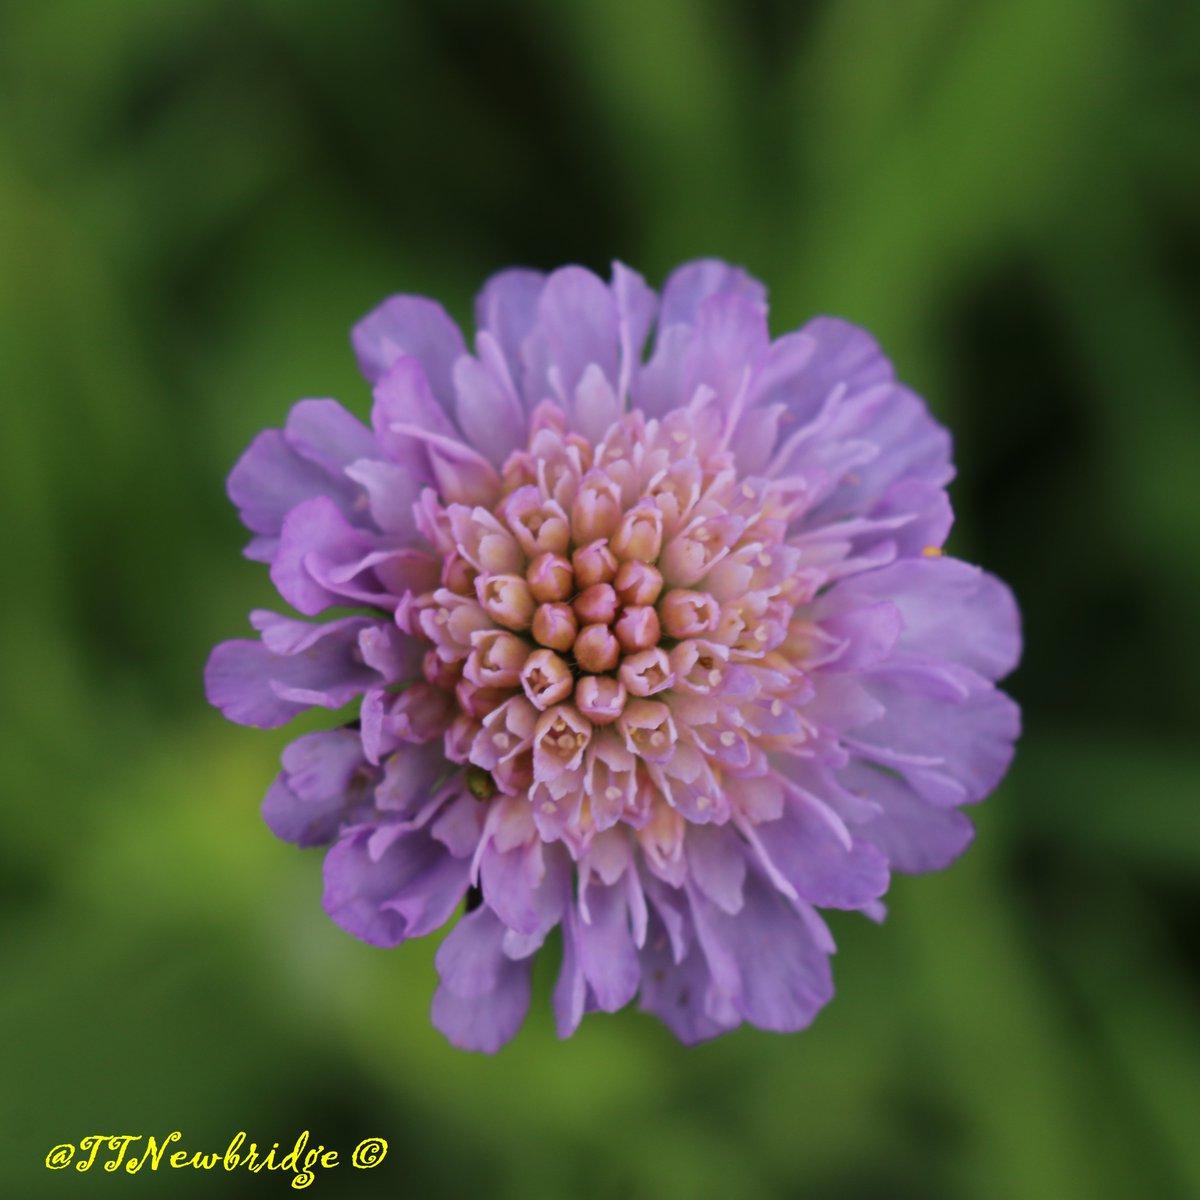 Scabious  #LiffeyLinearPark   #Wildflowerhour <br>http://pic.twitter.com/6m5BuXVAQN